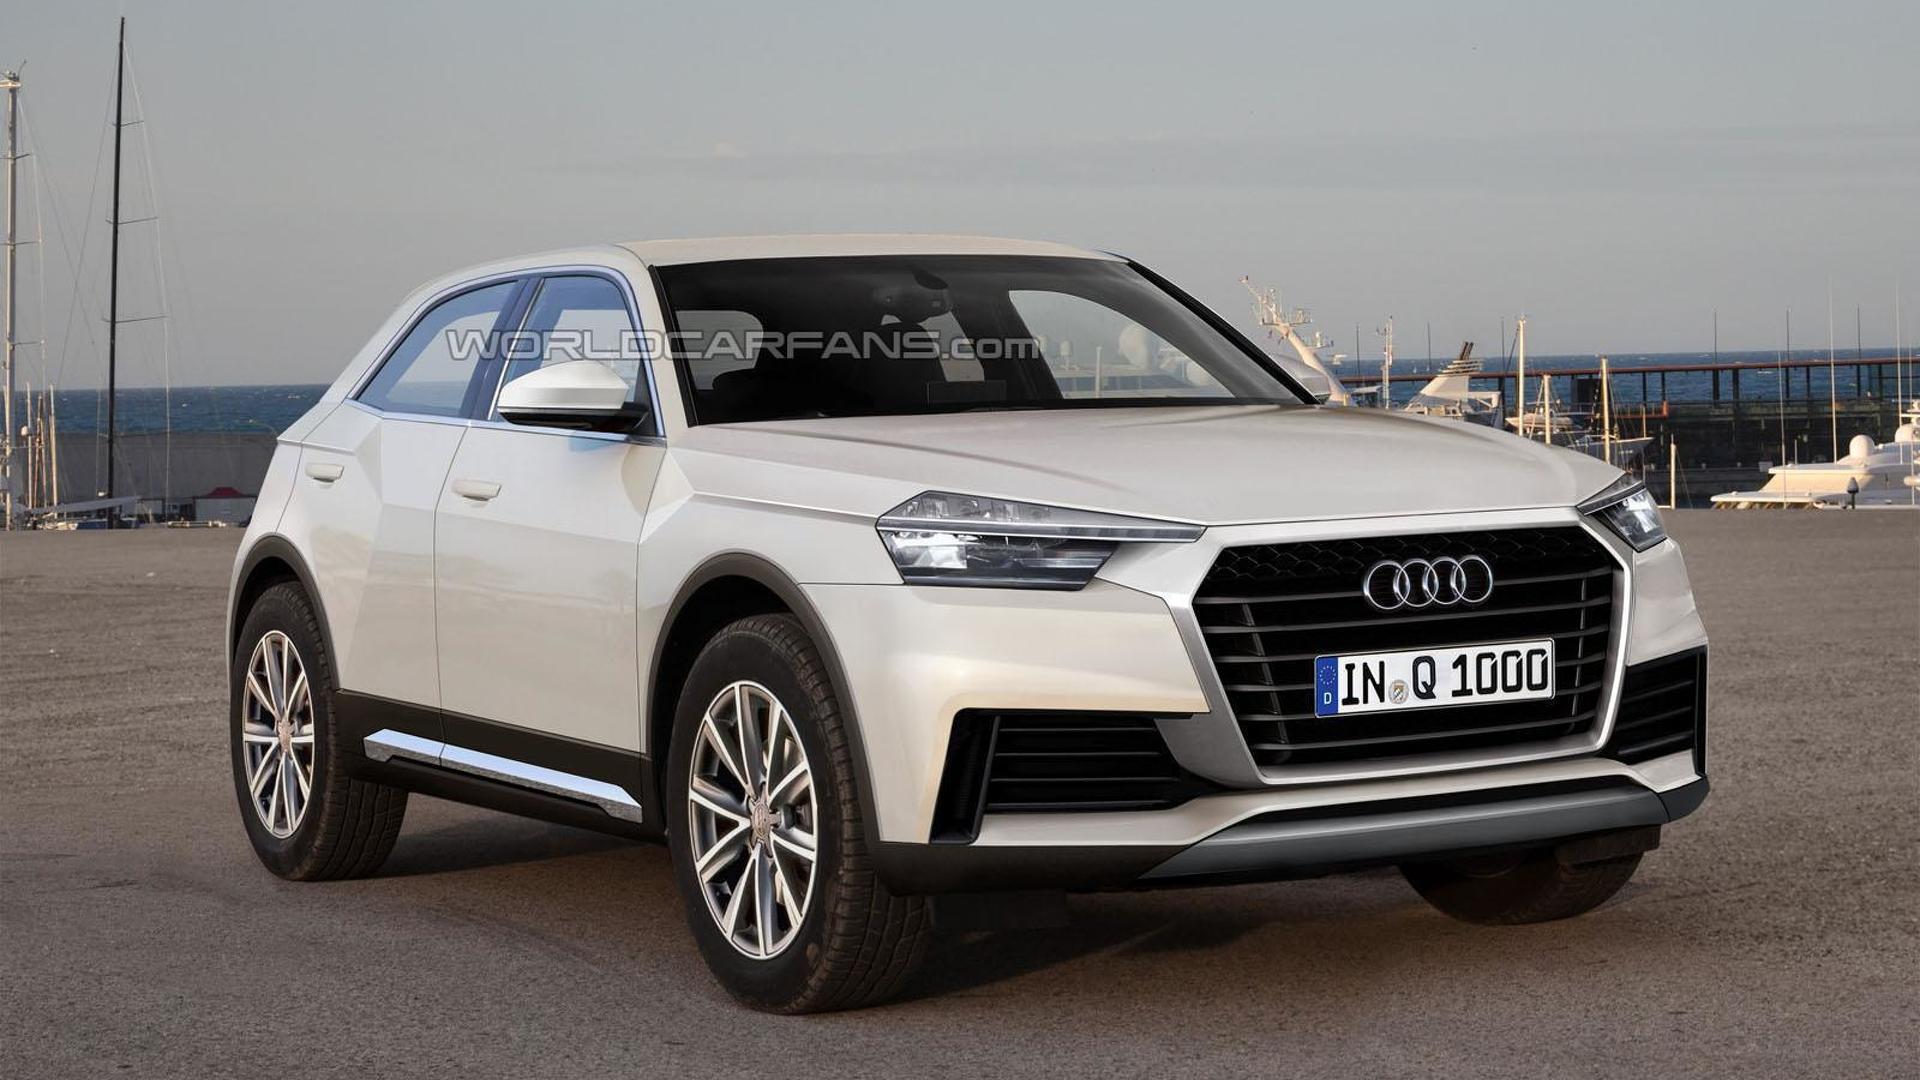 2016 Audi Q1 gets rendered